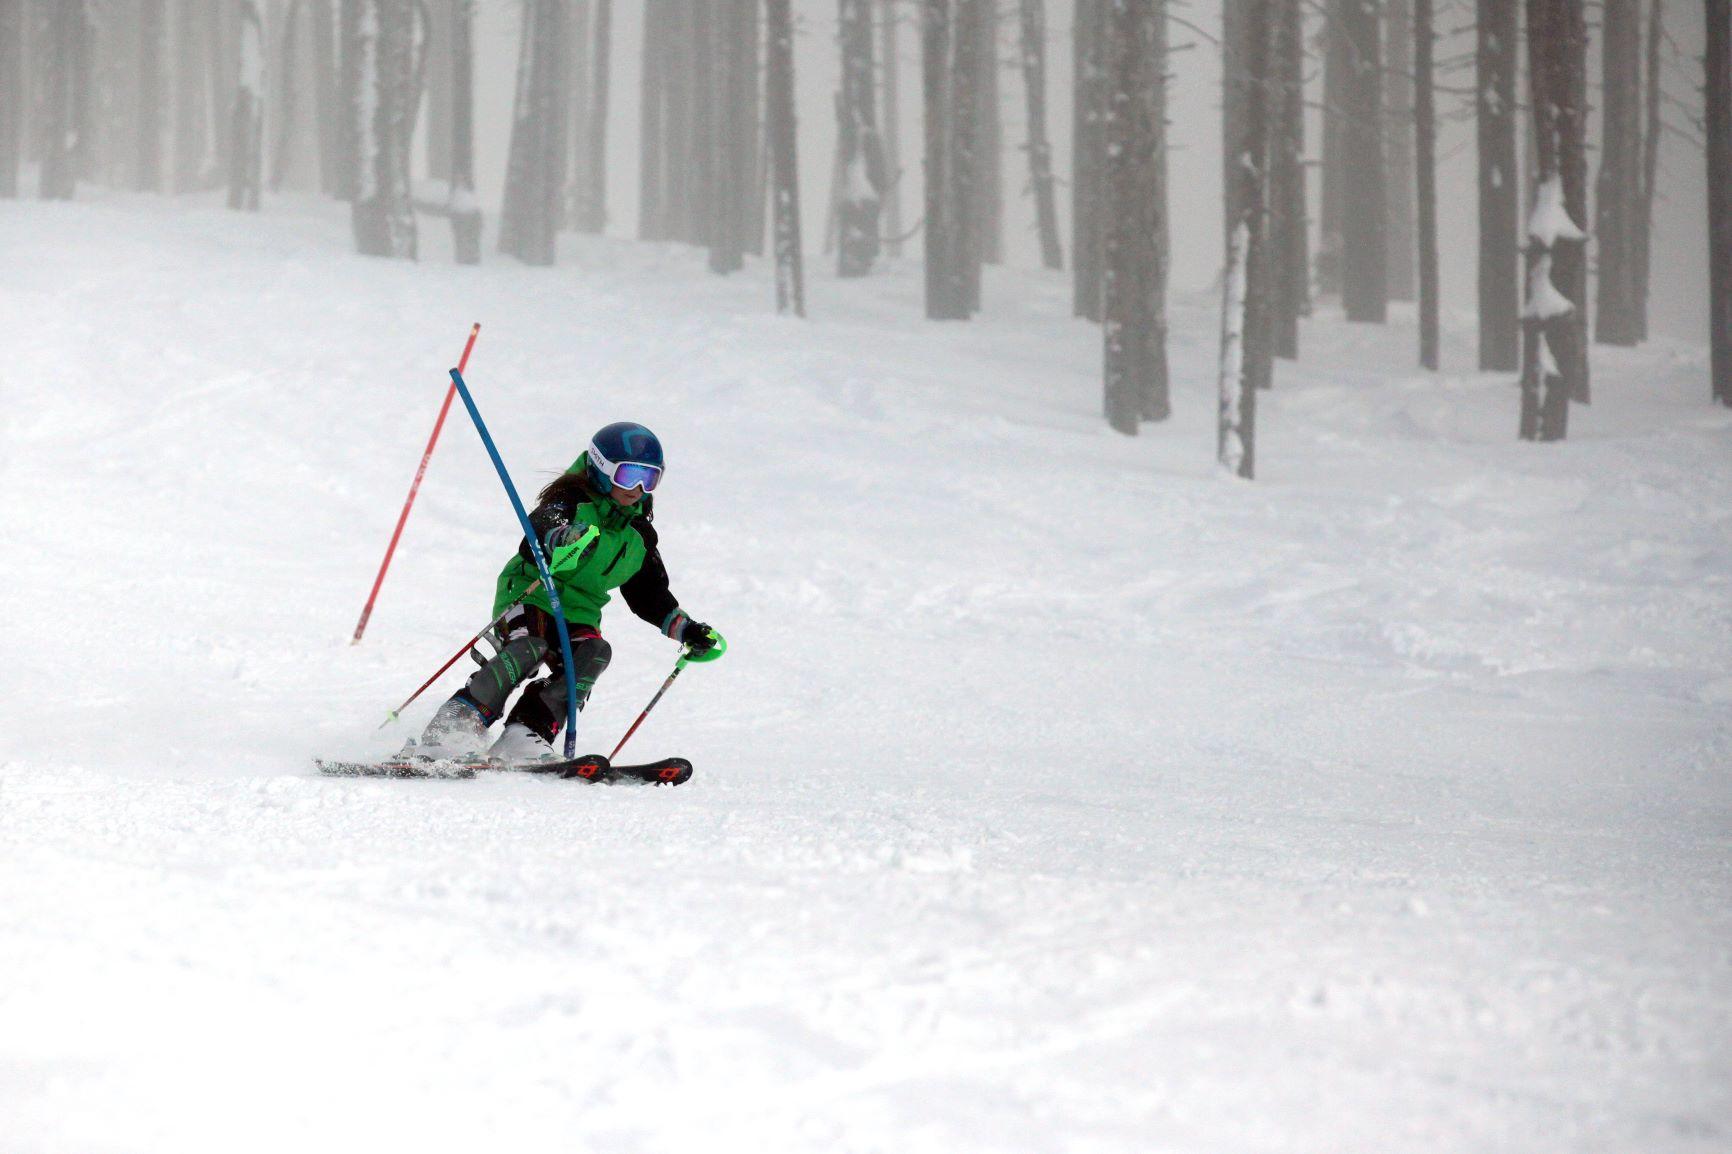 Ski racer turning around a slalom gate on race course.